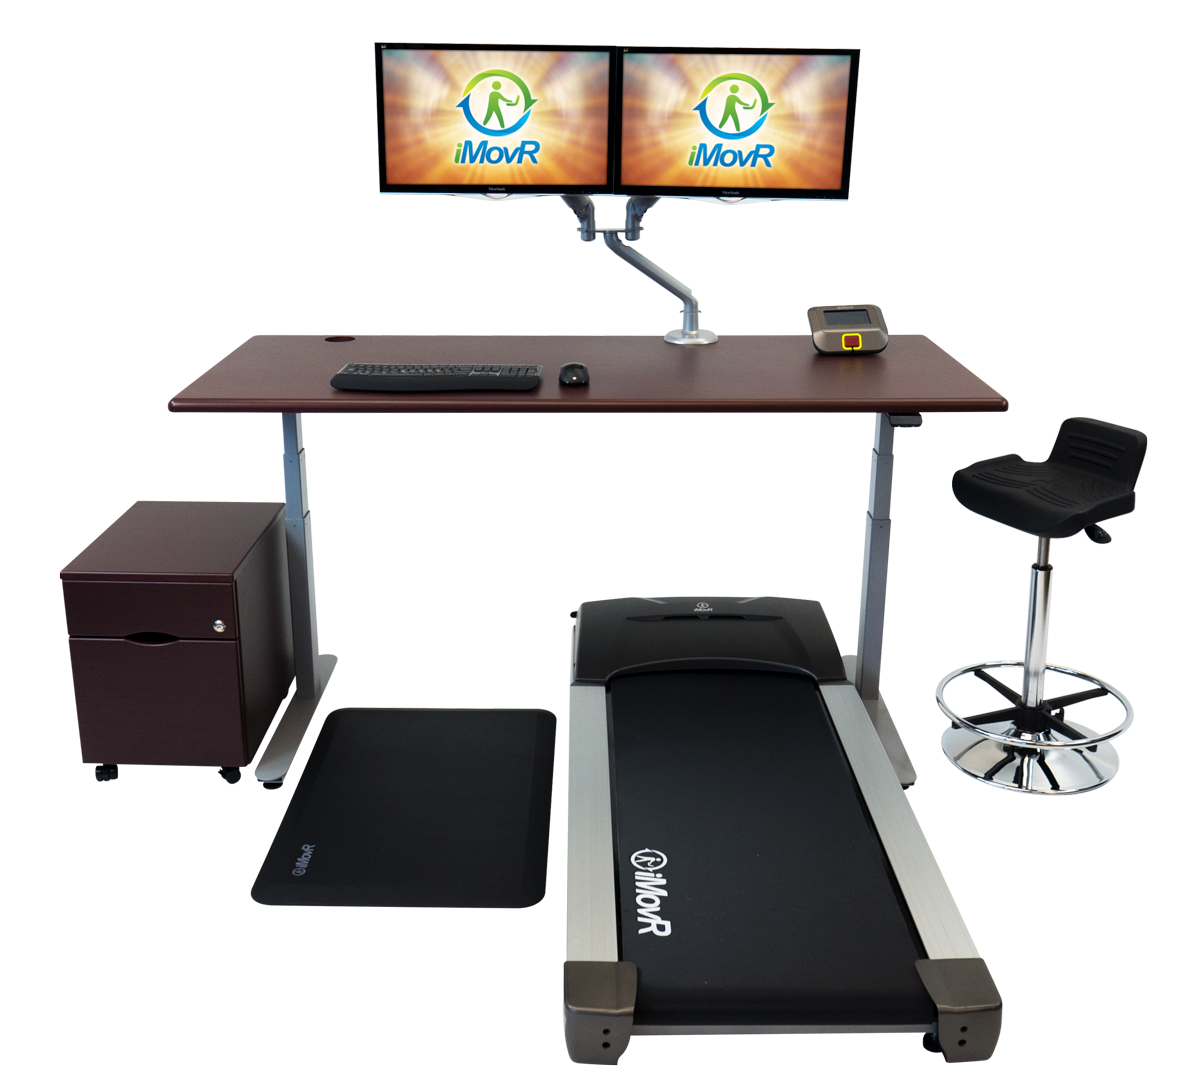 Lander Treadmill Desk in Clove Mahogany with Accessories